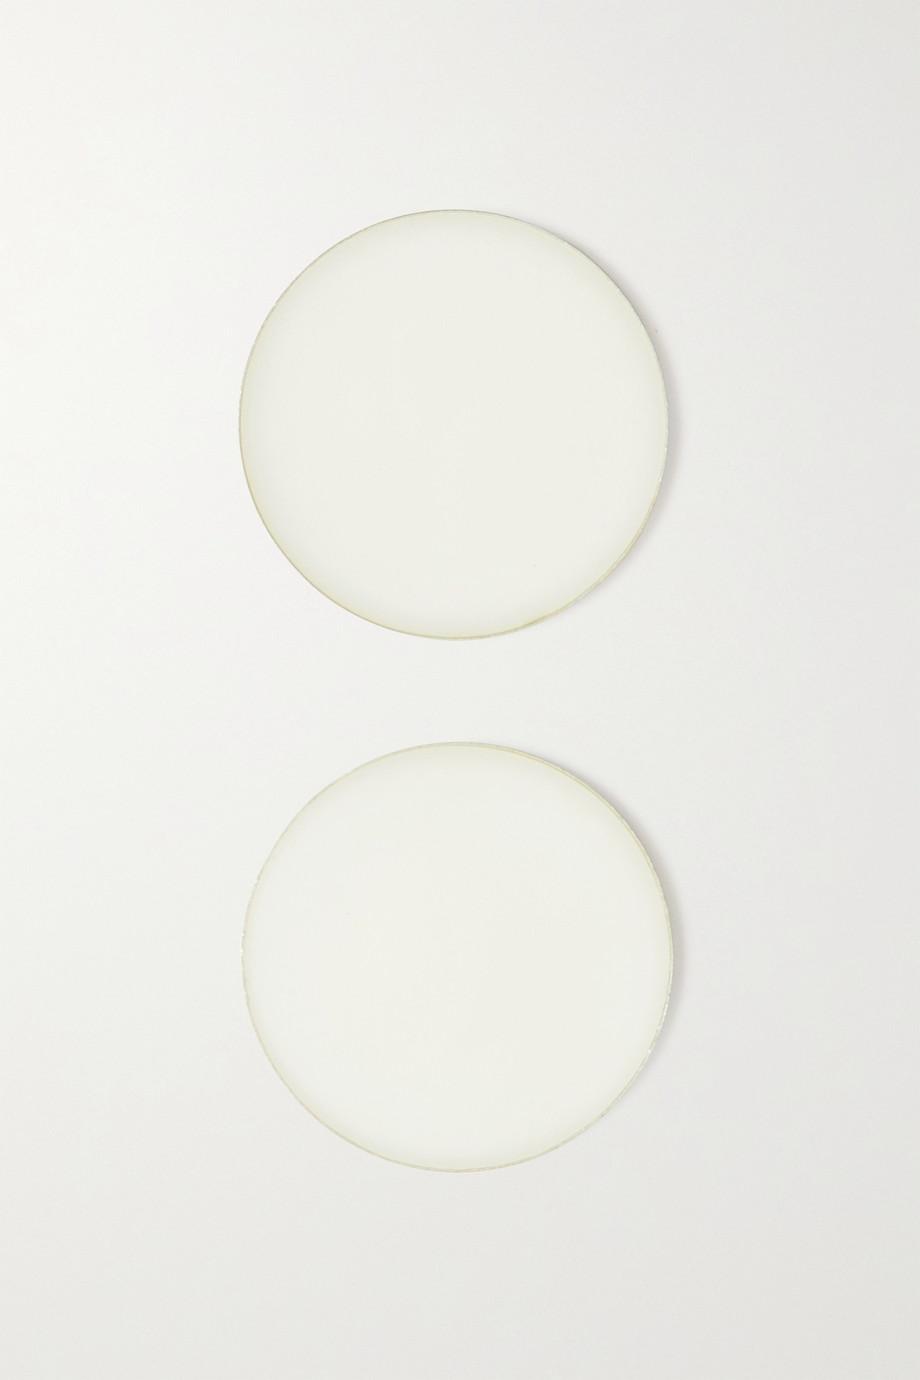 Diptyque Eau Capitale, 2 x 3 g – Nachfüll-Cremeparfum